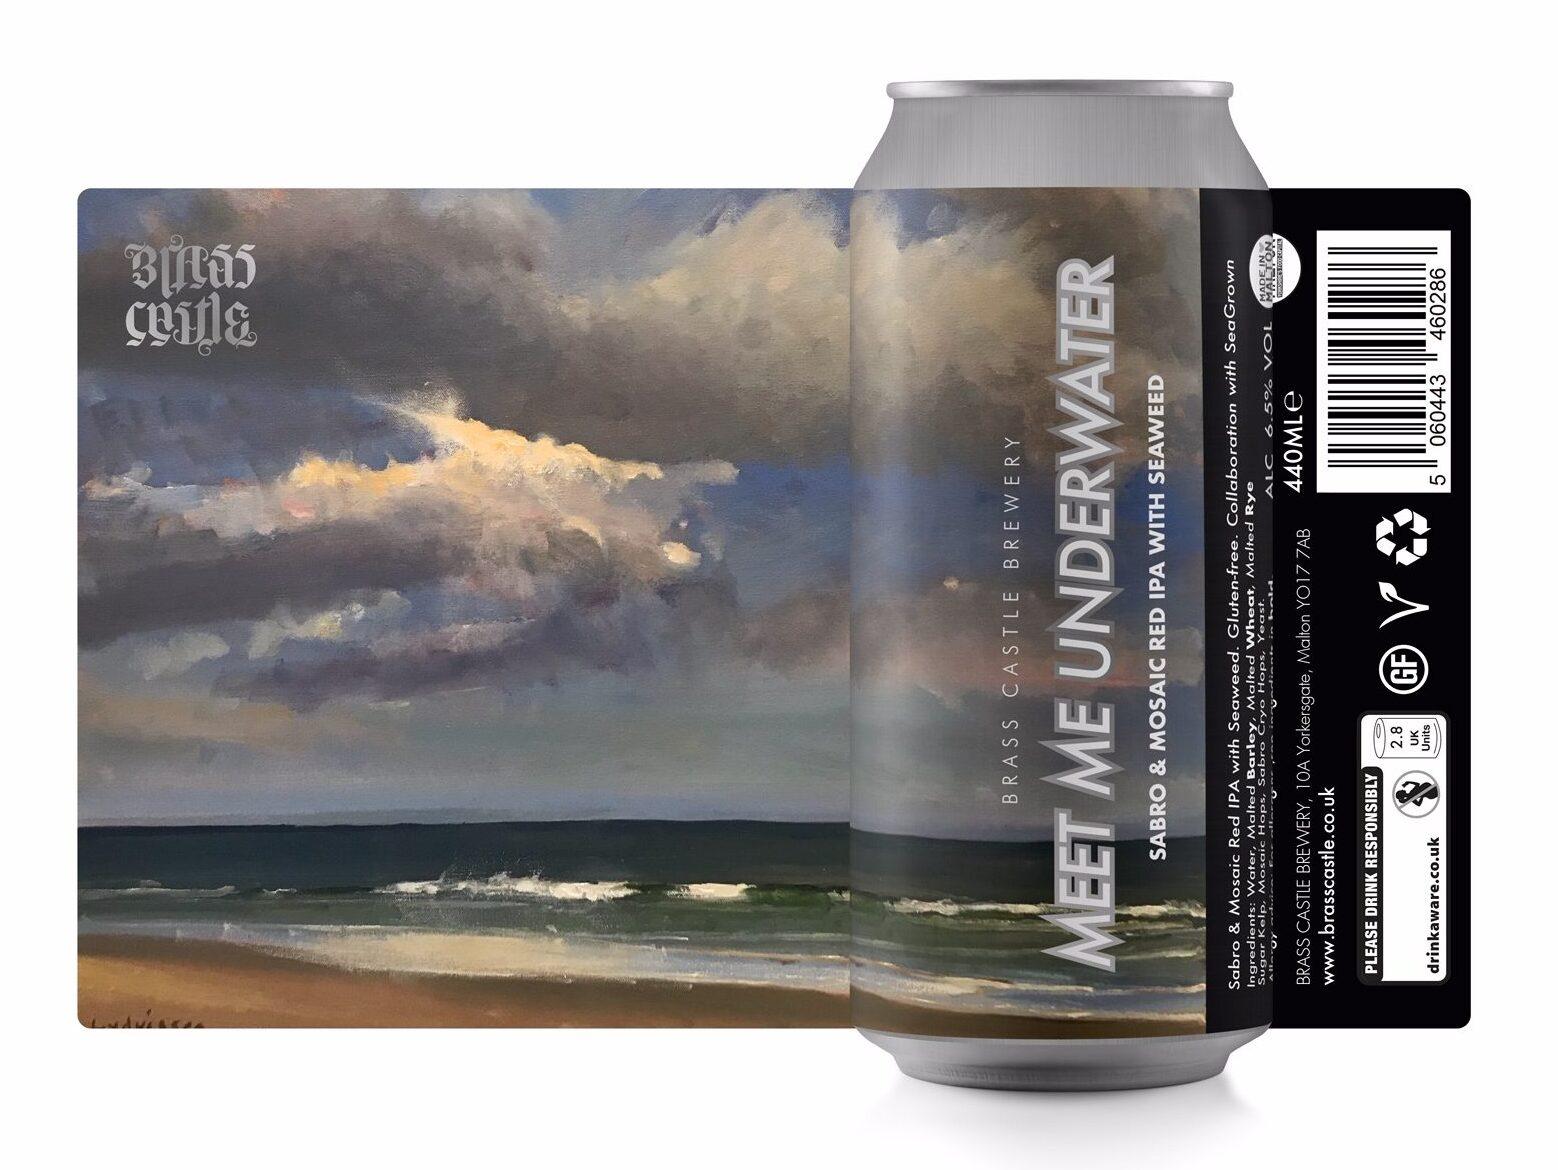 Brass Castle | Meet Me Underwater | Gluten Free Red IPA with Seaweed 6.5% 440ml